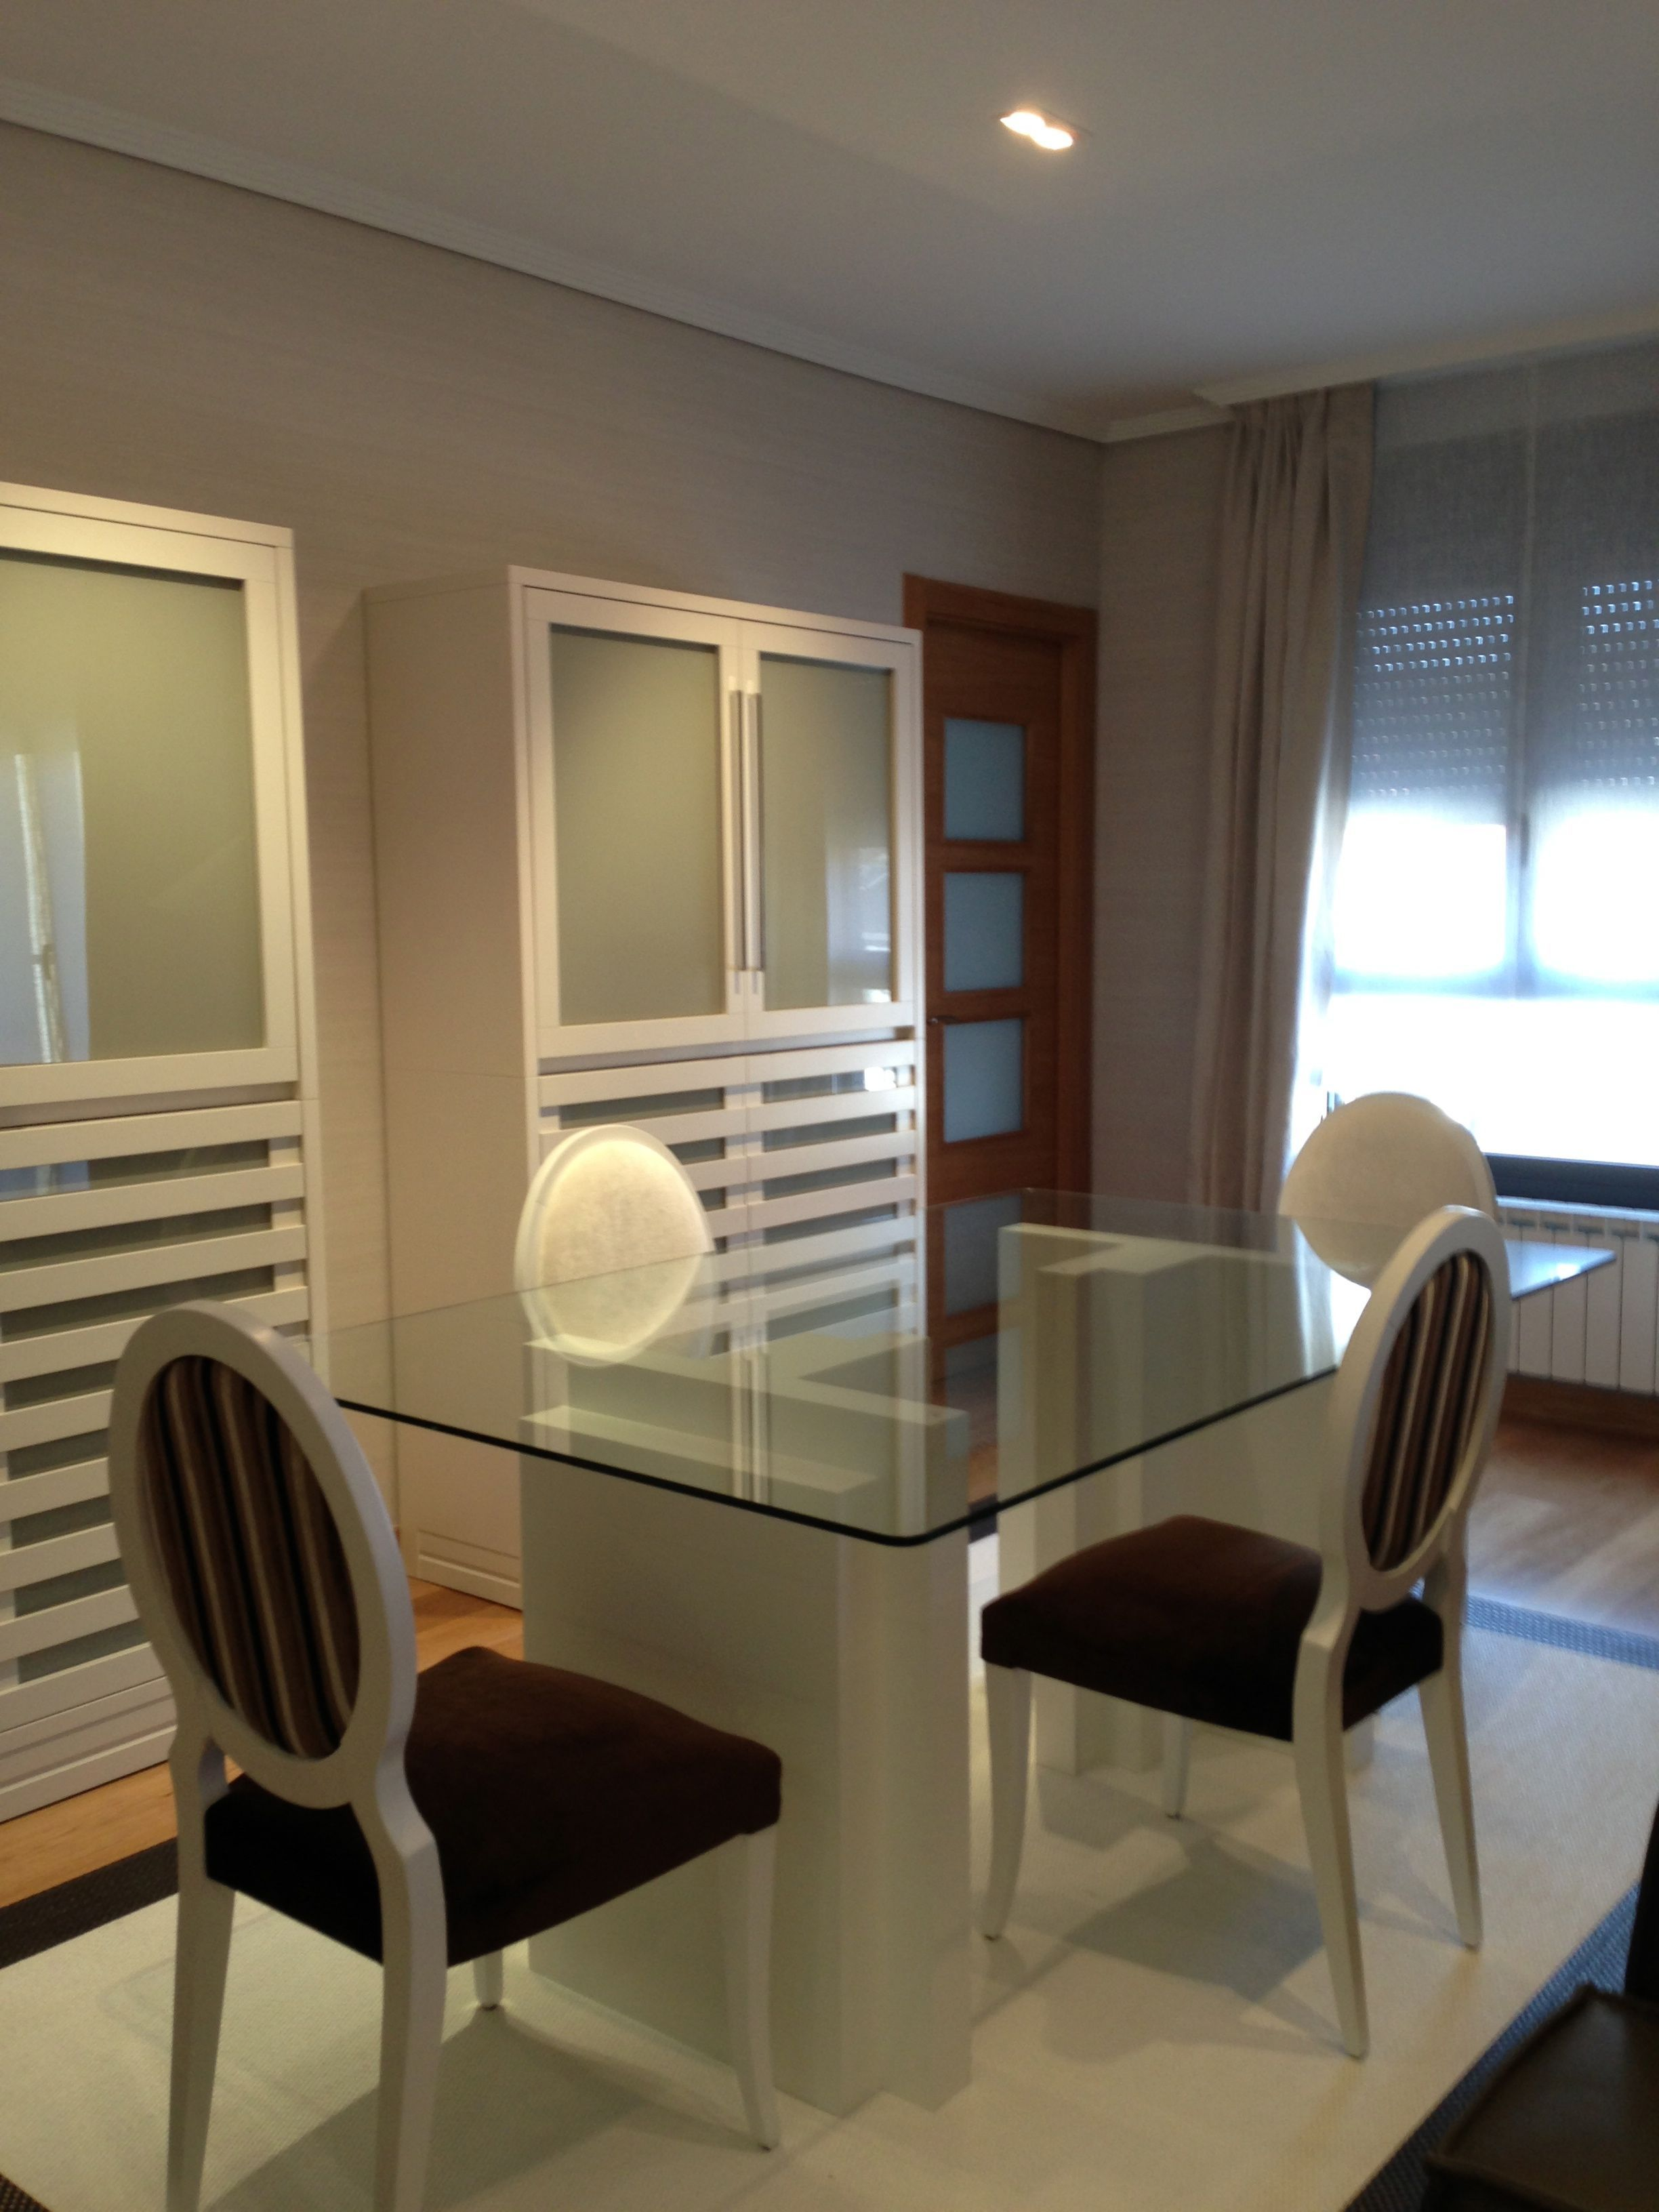 Comedor con mesa de cristal en komoda decoracion ideas for Ideas decoracion comedor